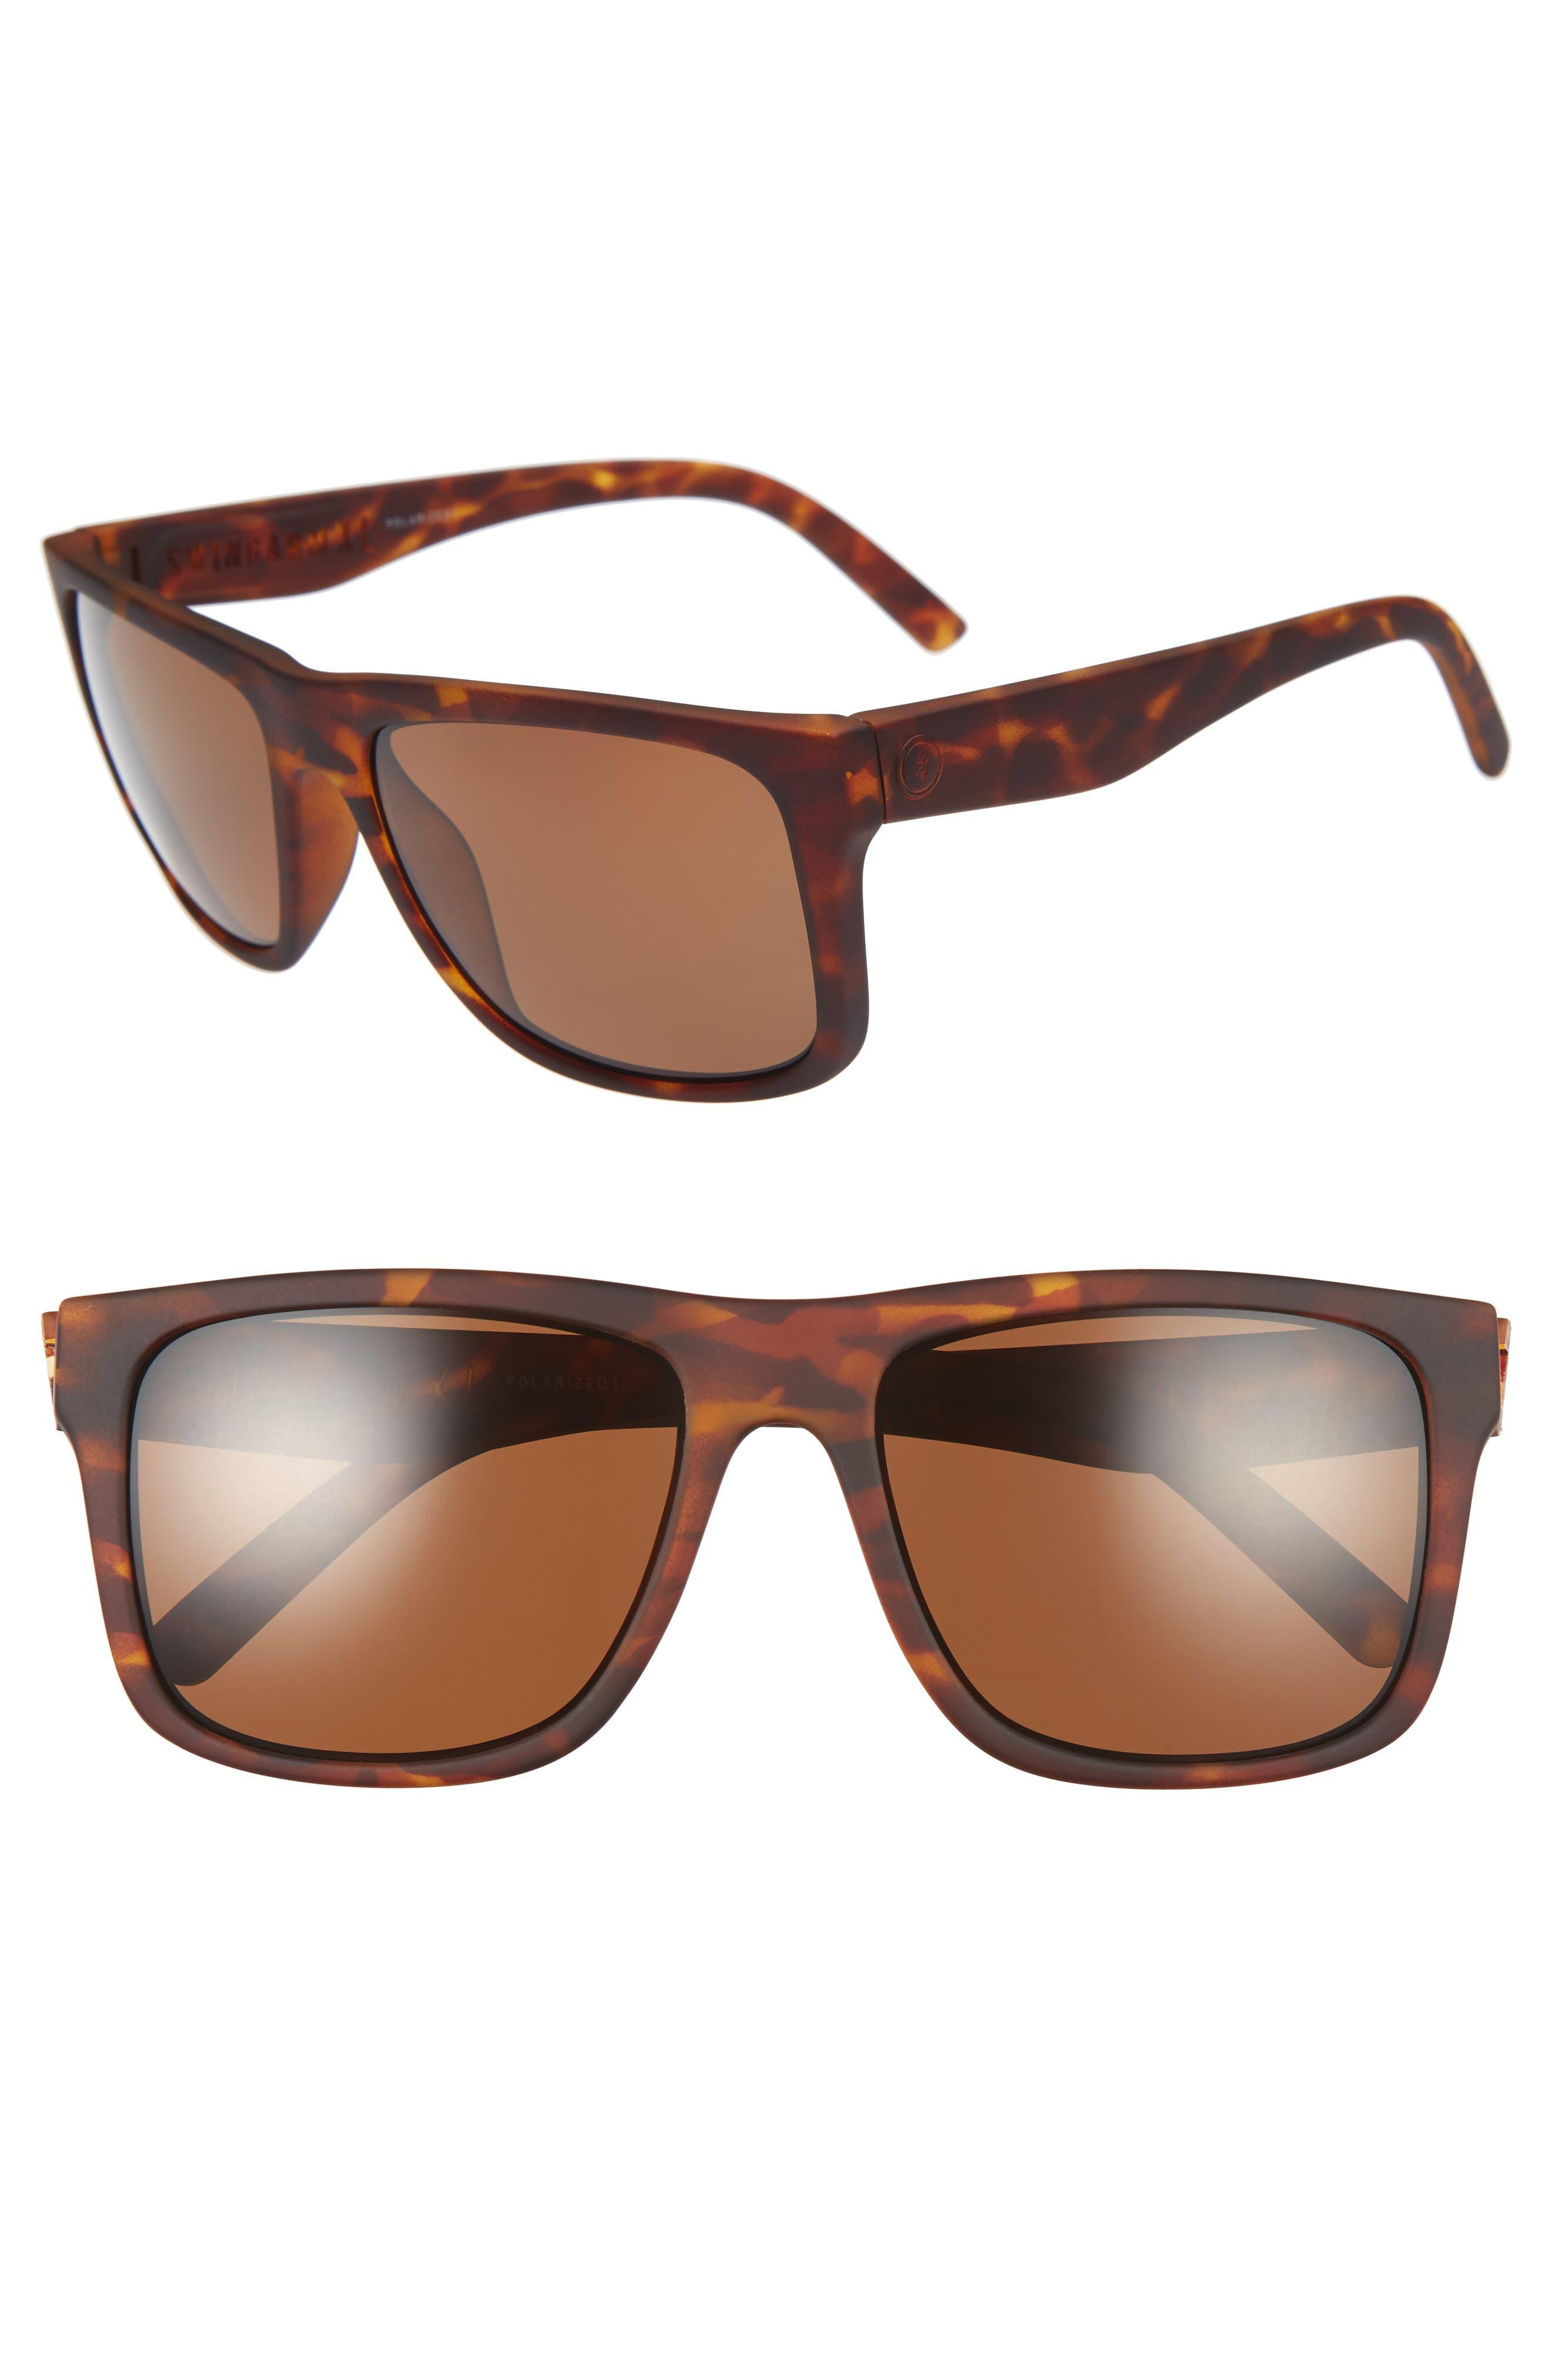 Swingarm XL 59mm Polarized Sunglasses,                             Main thumbnail 1, color,                             200